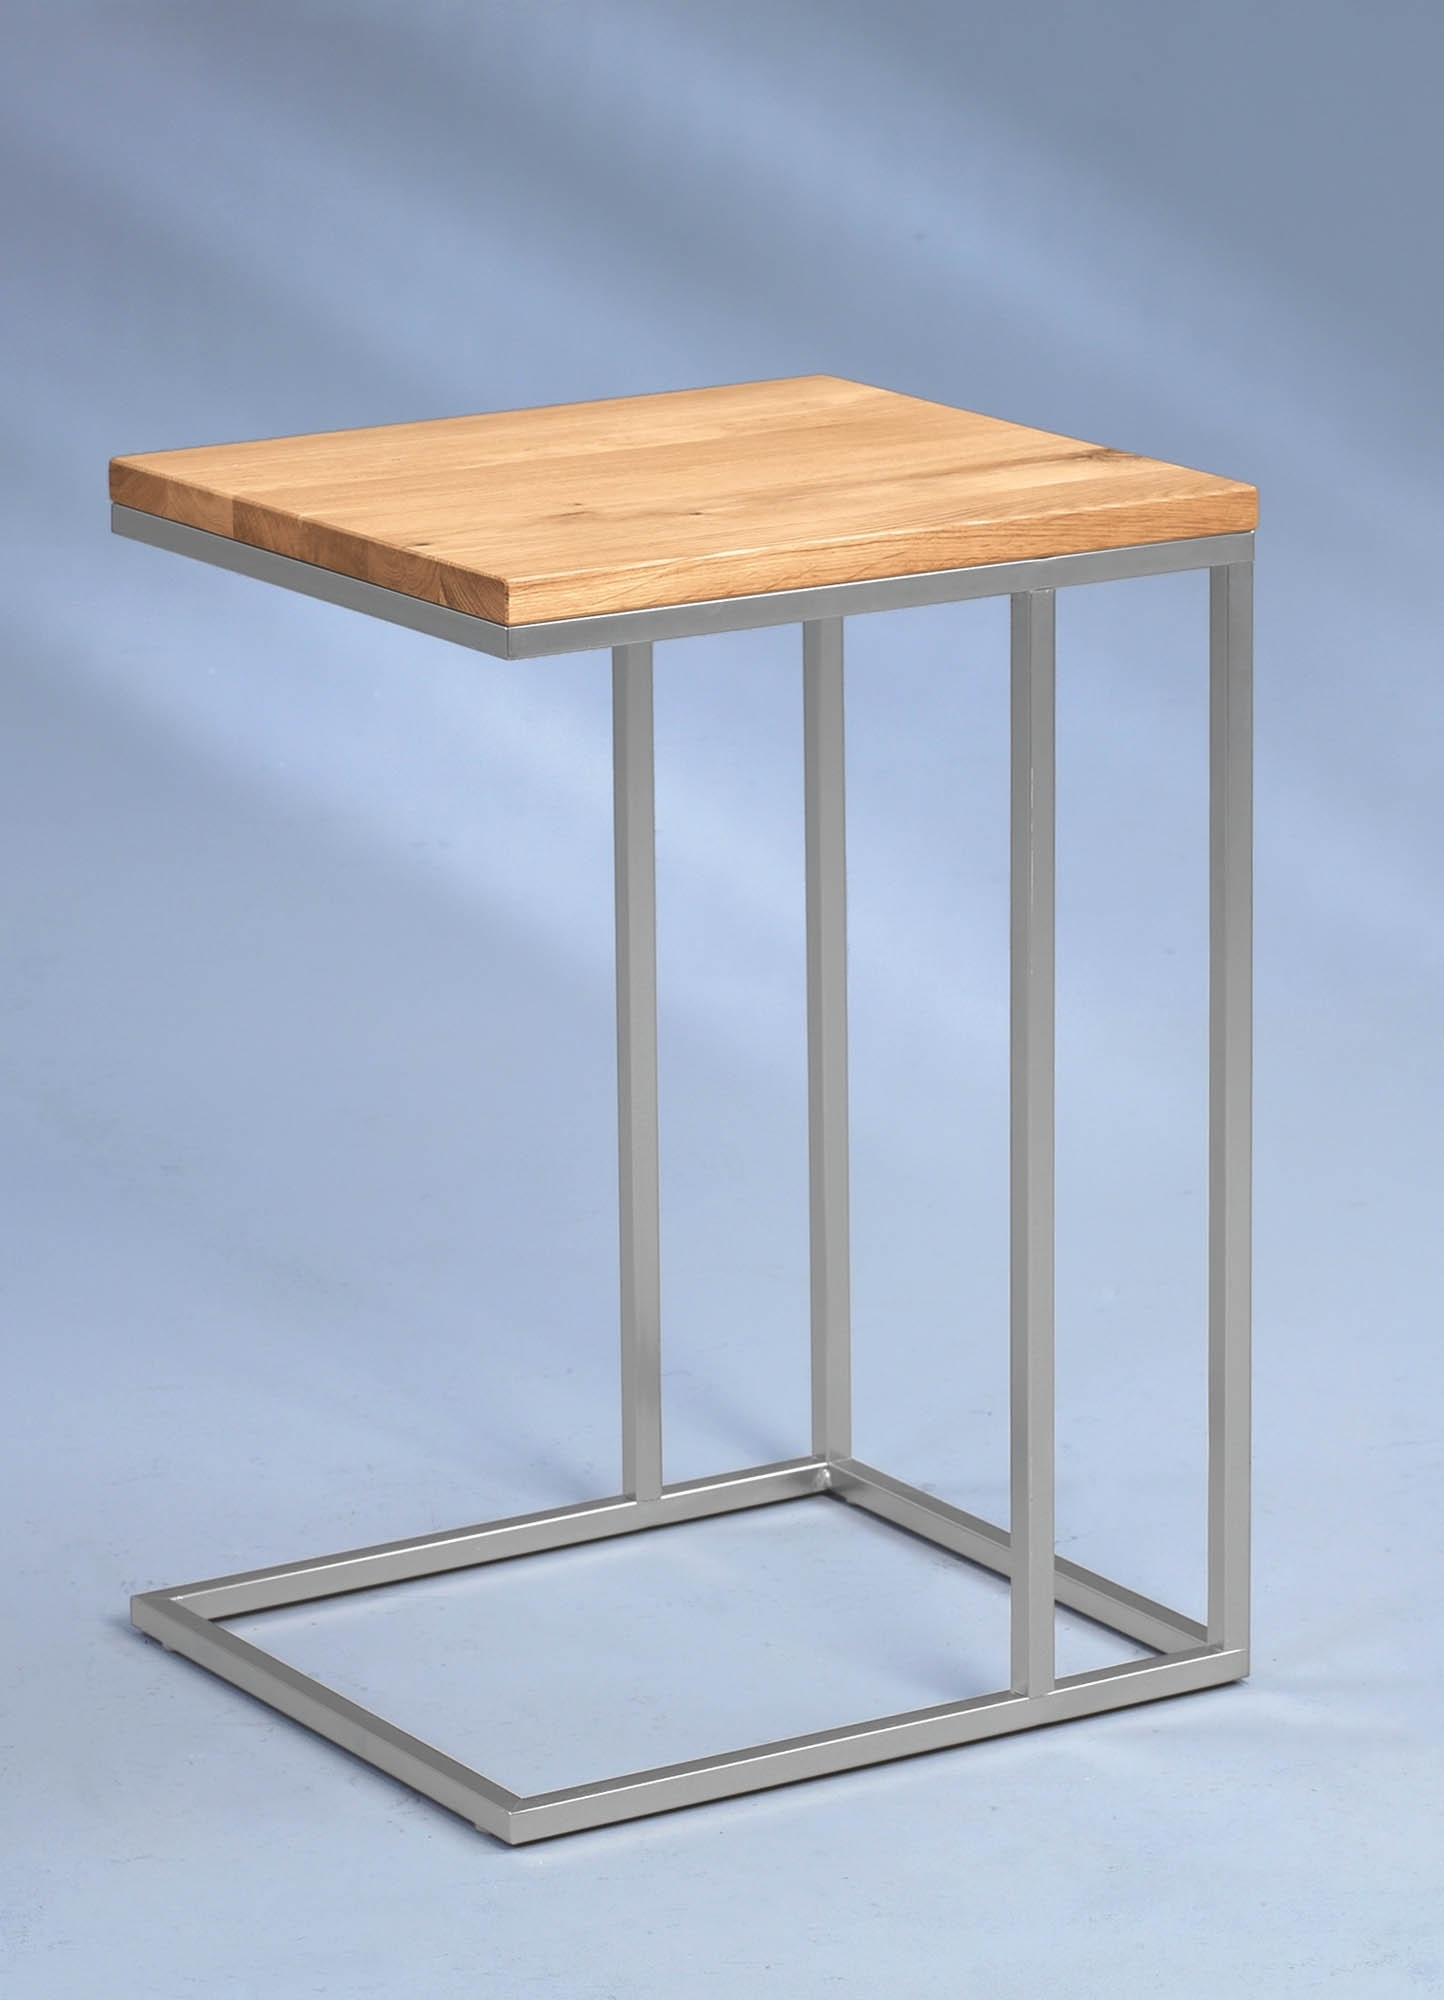 beistelltisch finn 583488 gestell metall edelstahloptik wildeiche massiv ge lt ebay. Black Bedroom Furniture Sets. Home Design Ideas